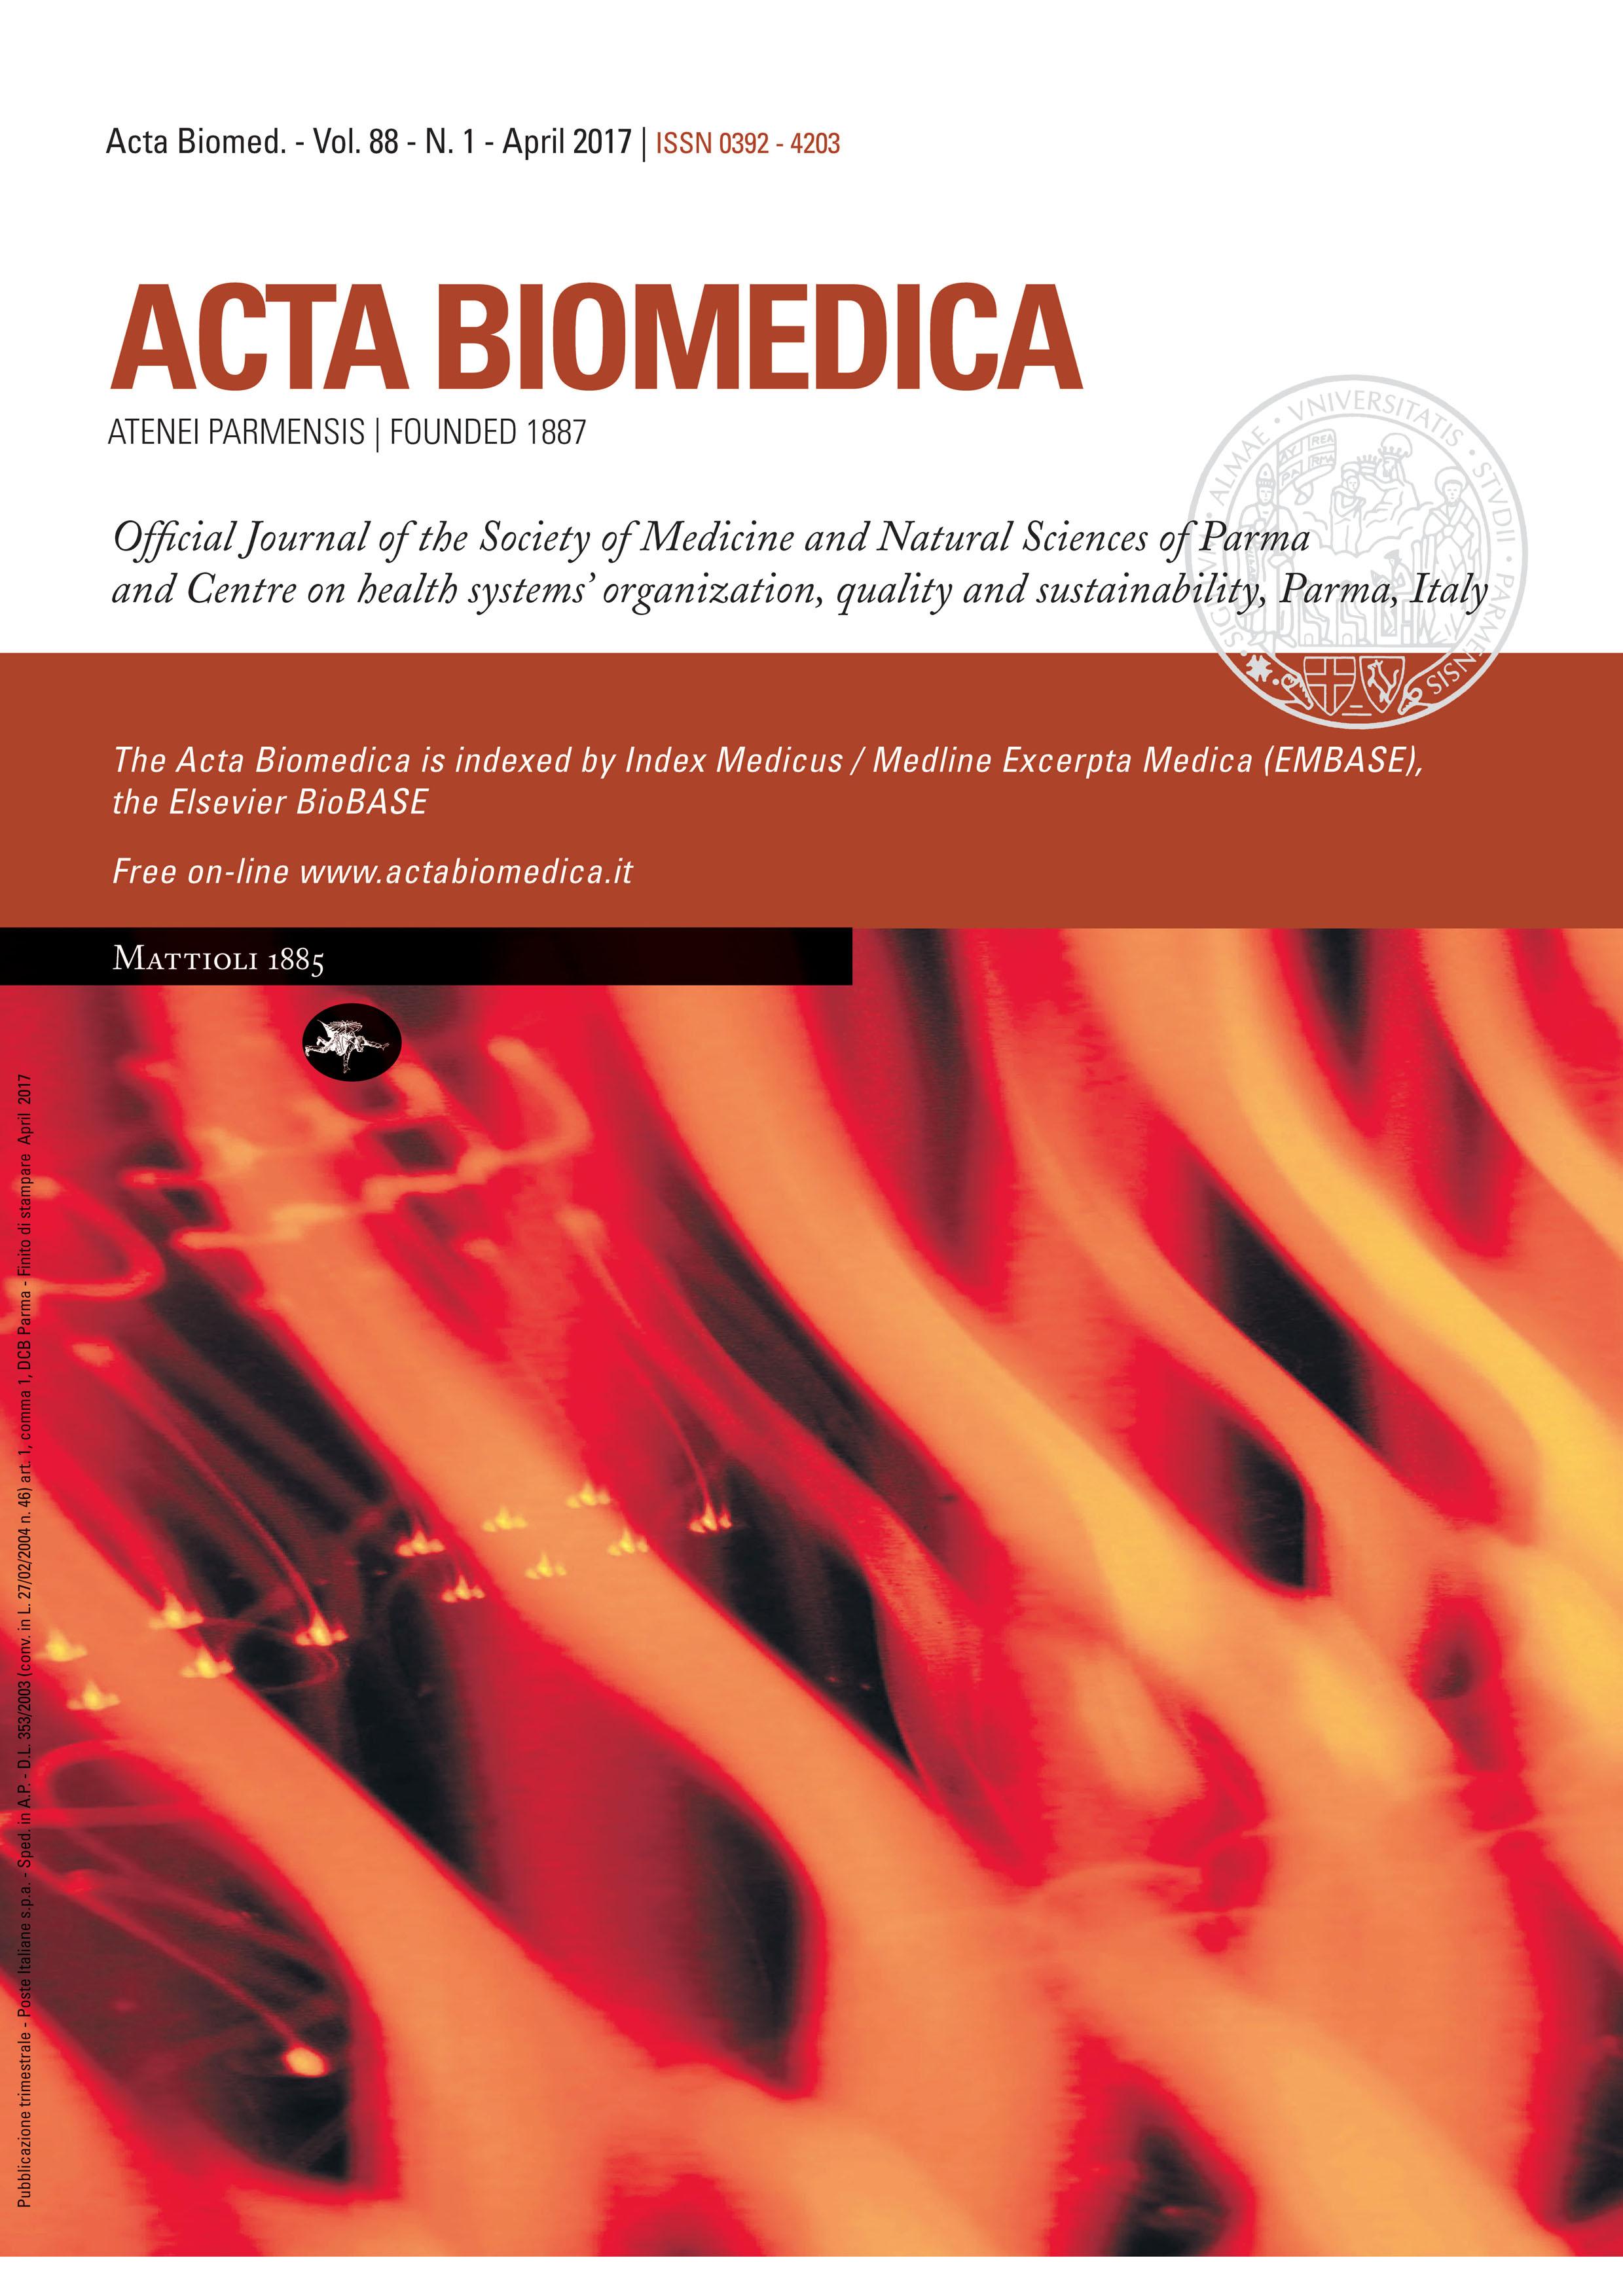 Acta BioMedica – MattioliHealth